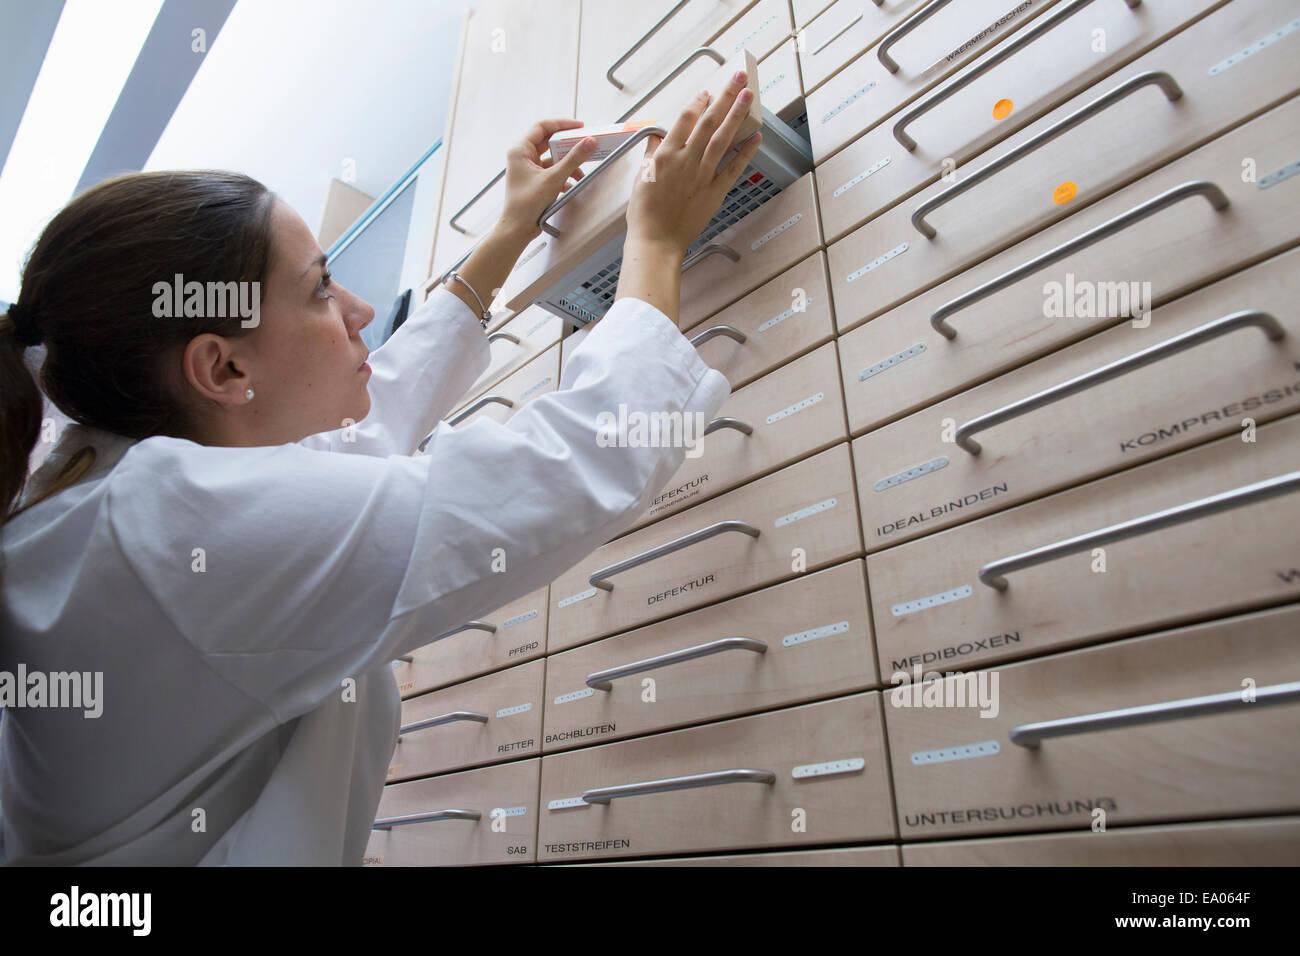 Pharmacist in pharmacy filing medicine away in drawer - Stock Image